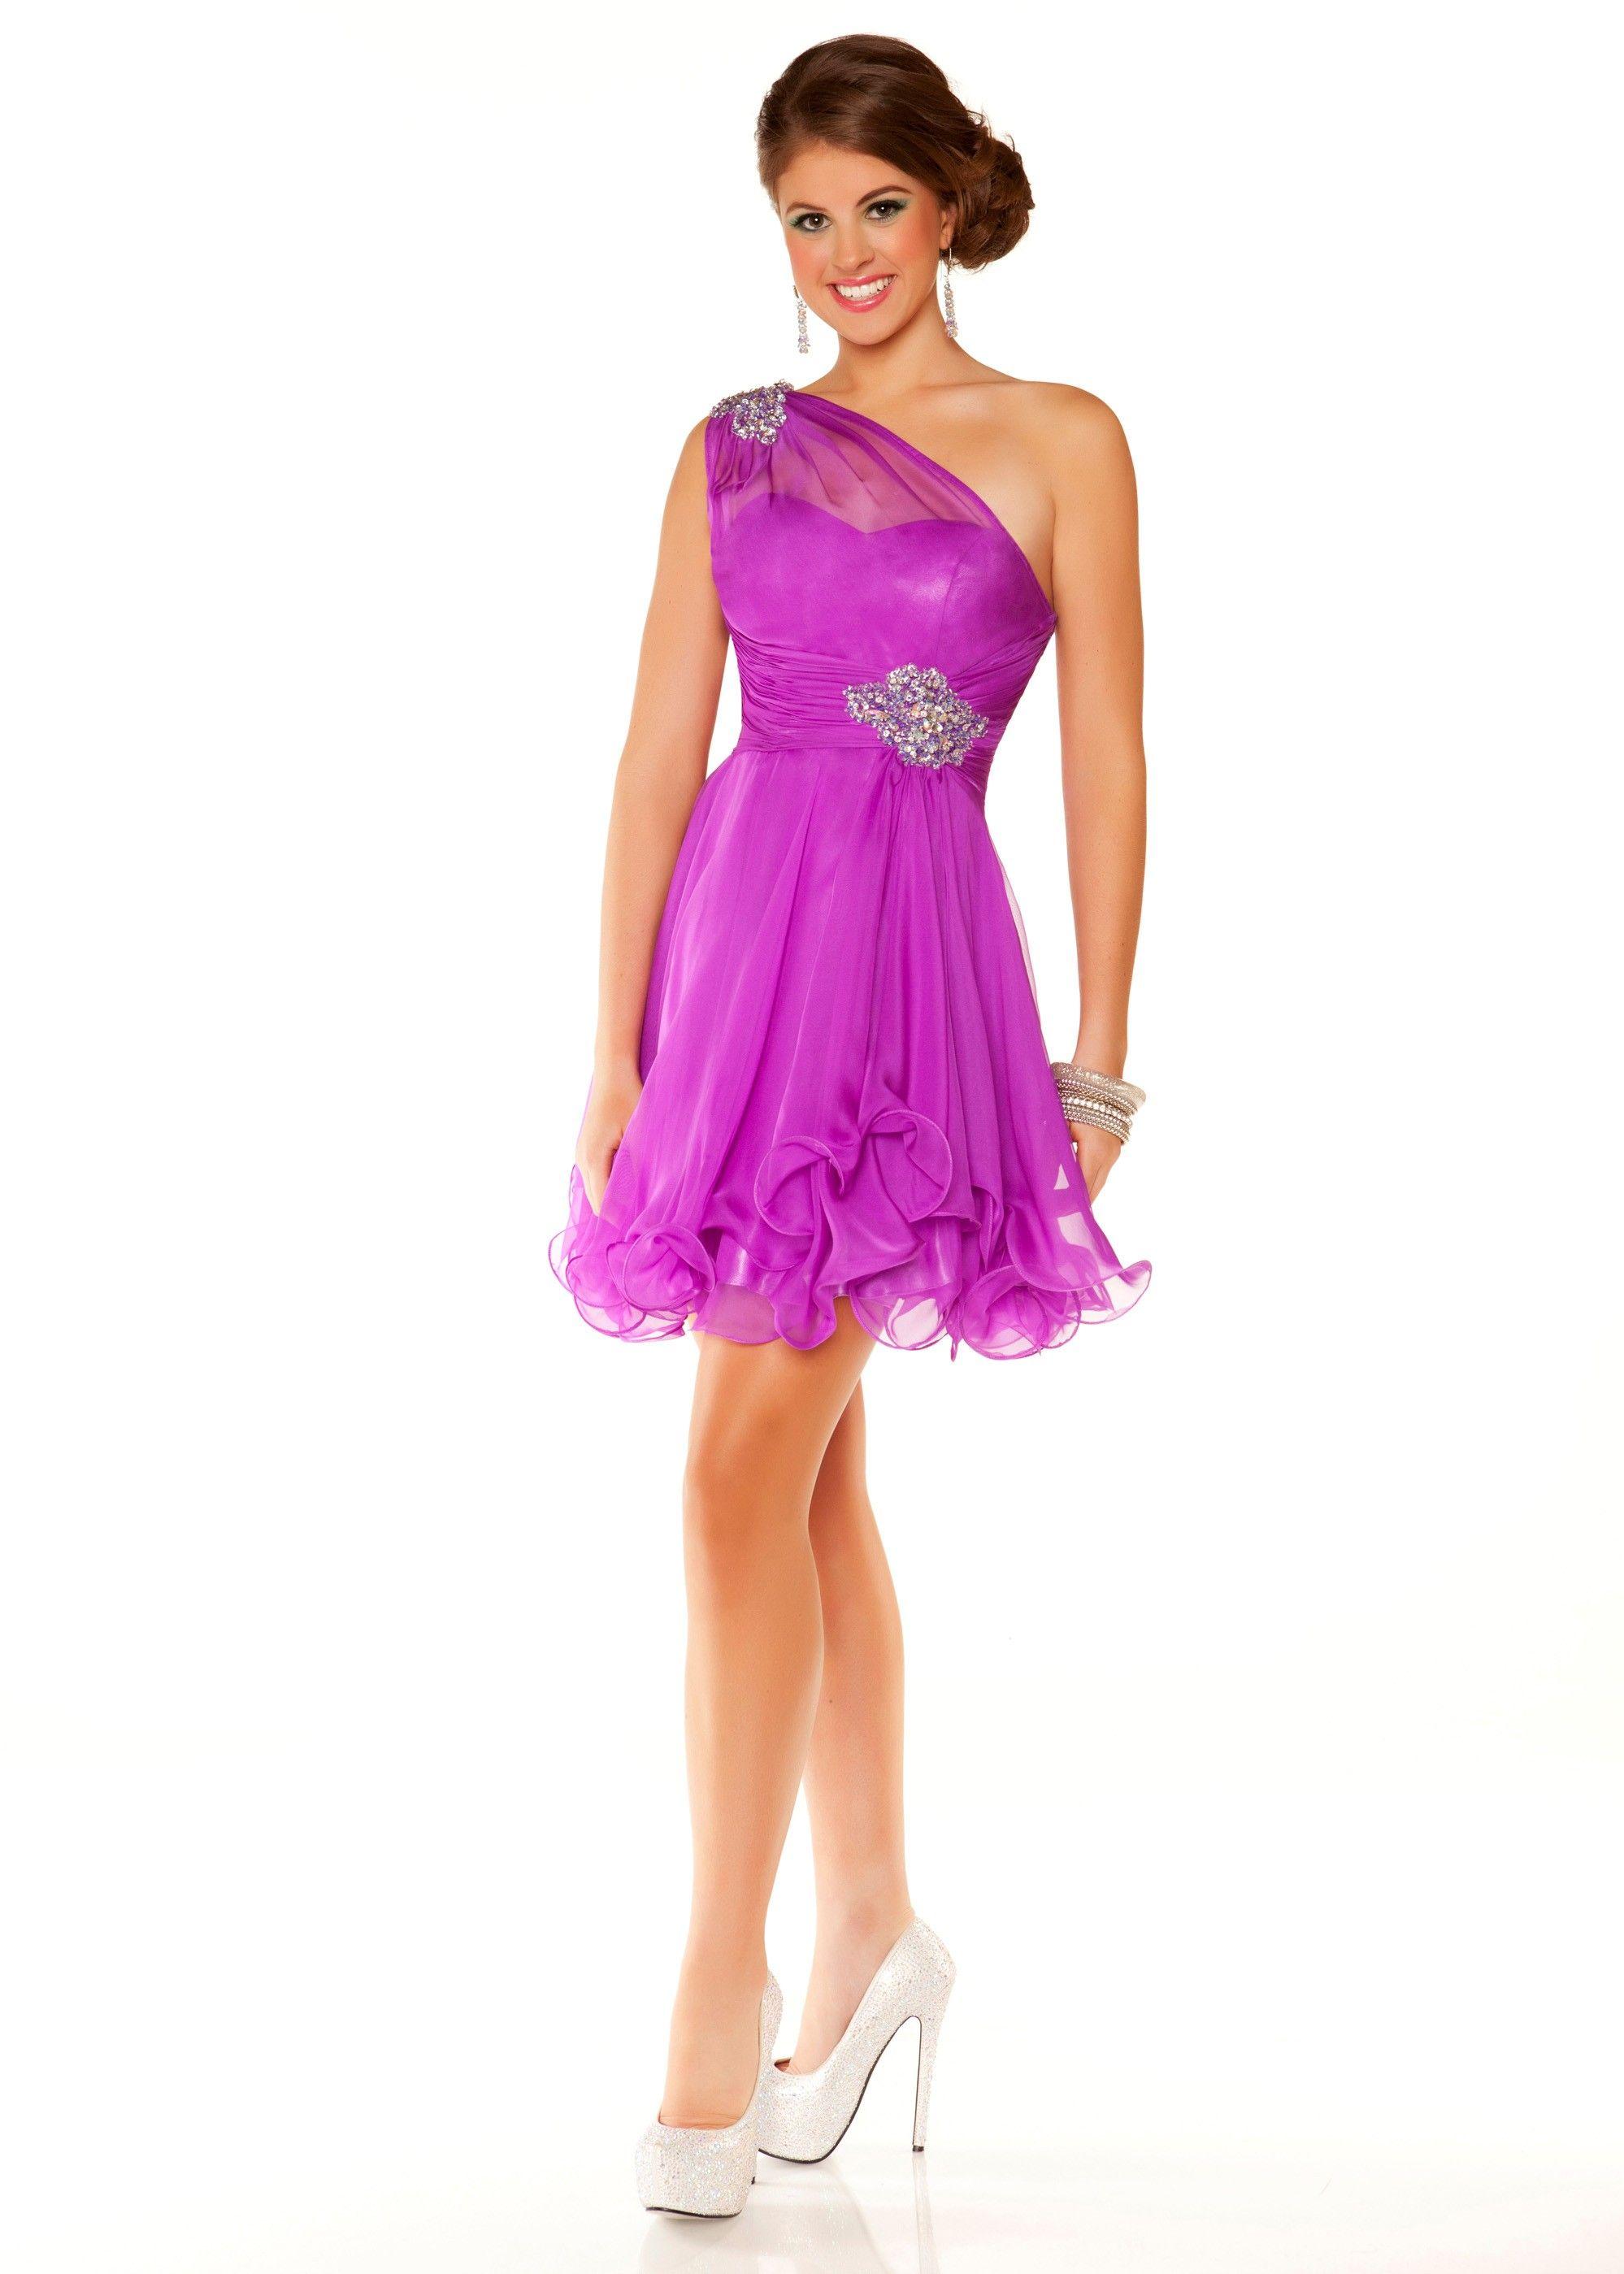 Mac Duggal 81703N - Violet One Shoulder Dress - RissyRoos.com | My ...